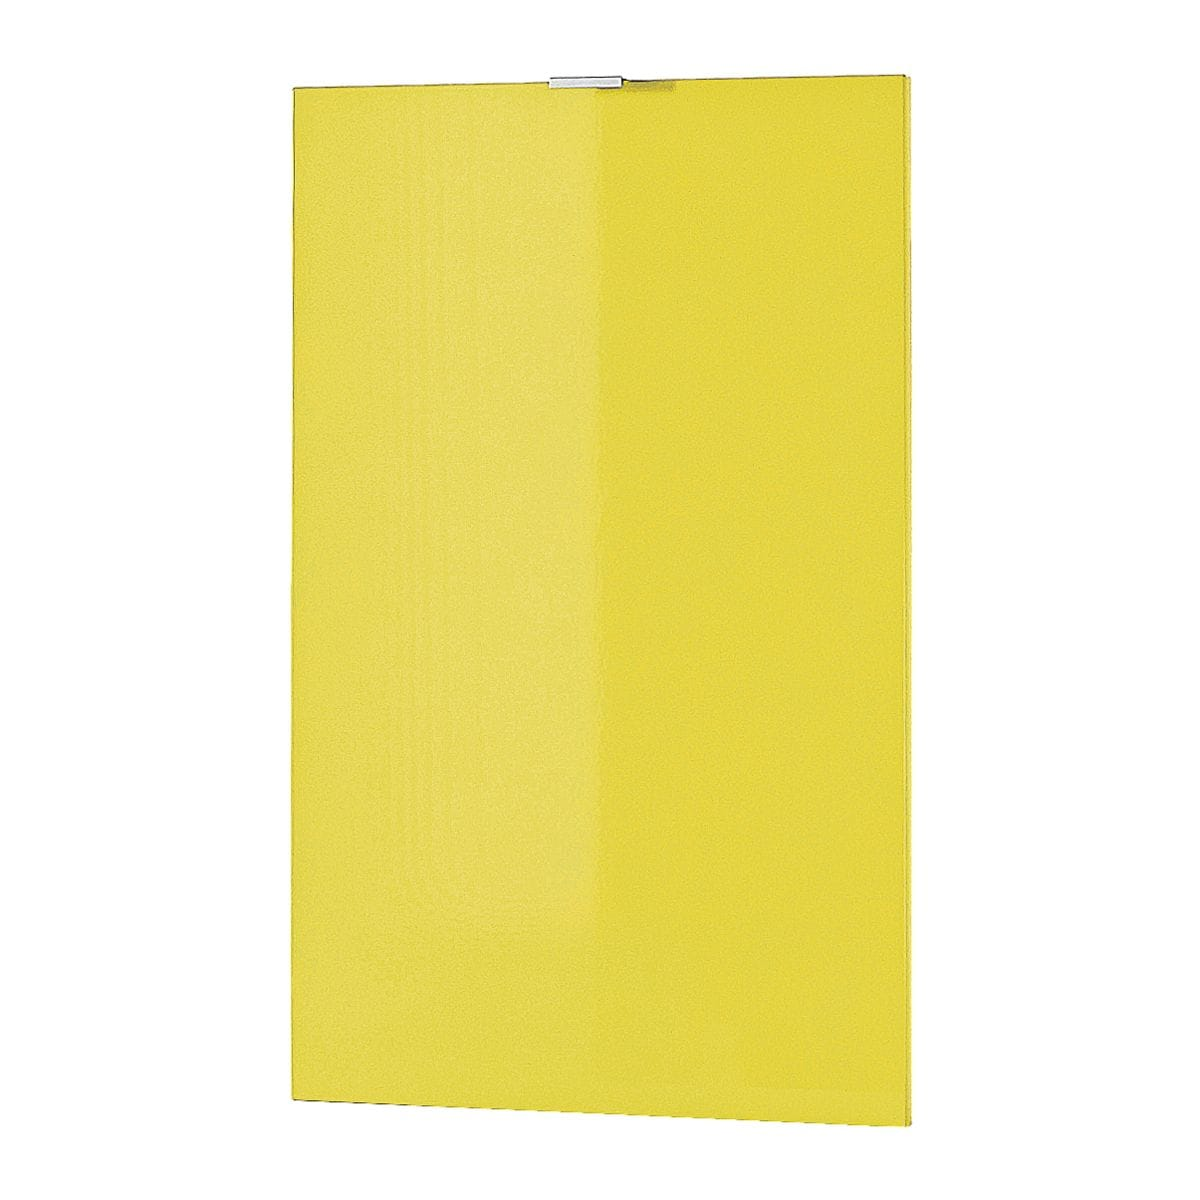 germania werke t r f r kommode sideboard kommoden set colorado bei otto office g nstig kaufen. Black Bedroom Furniture Sets. Home Design Ideas